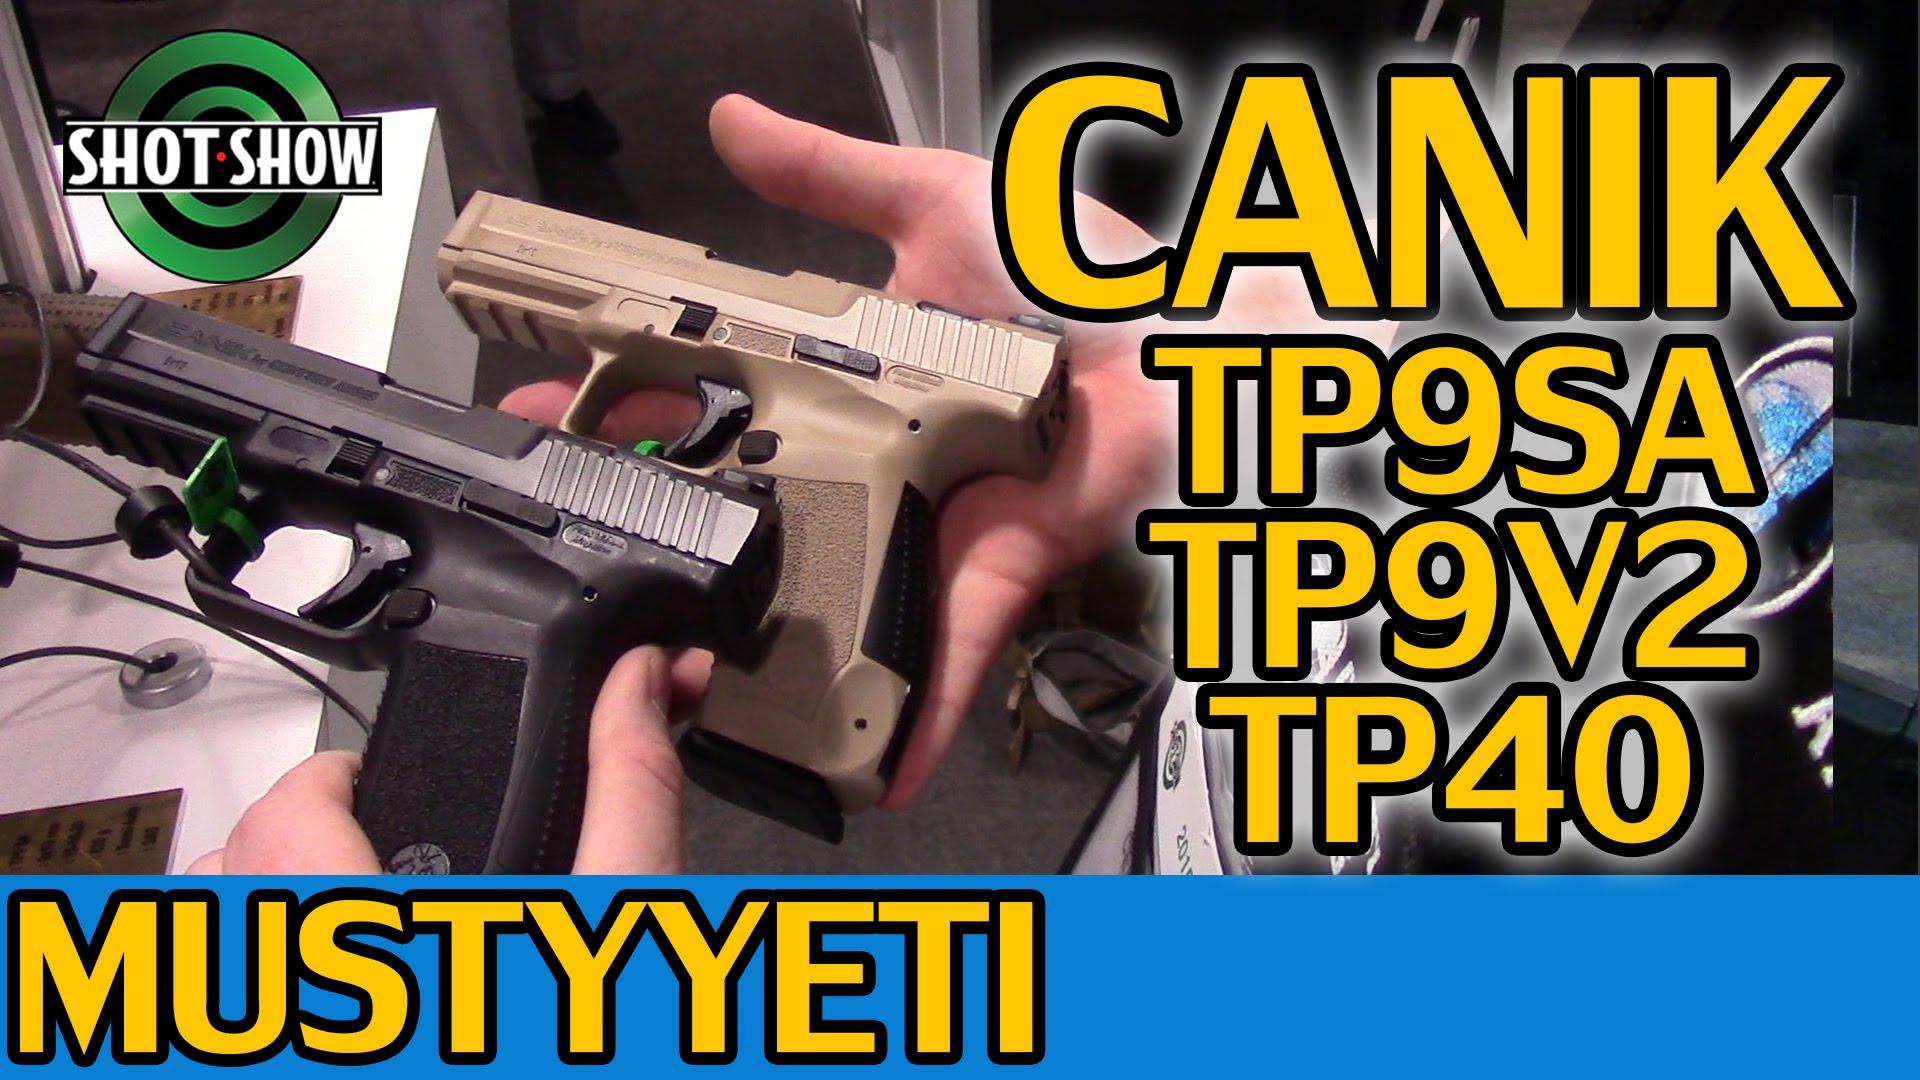 Canik Pistols   Shot Show 2015   Musty Yeti